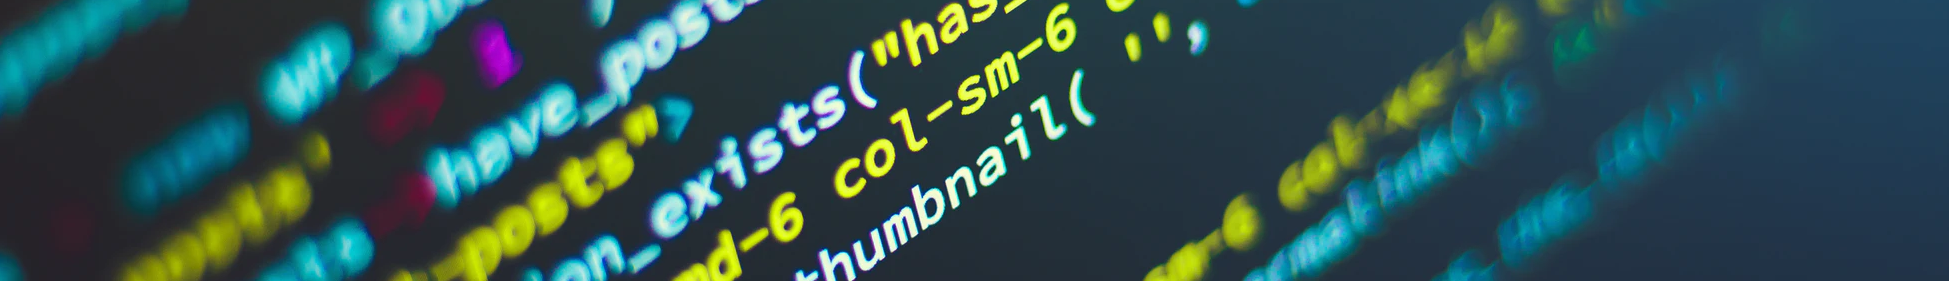 Secure Software Development: Web